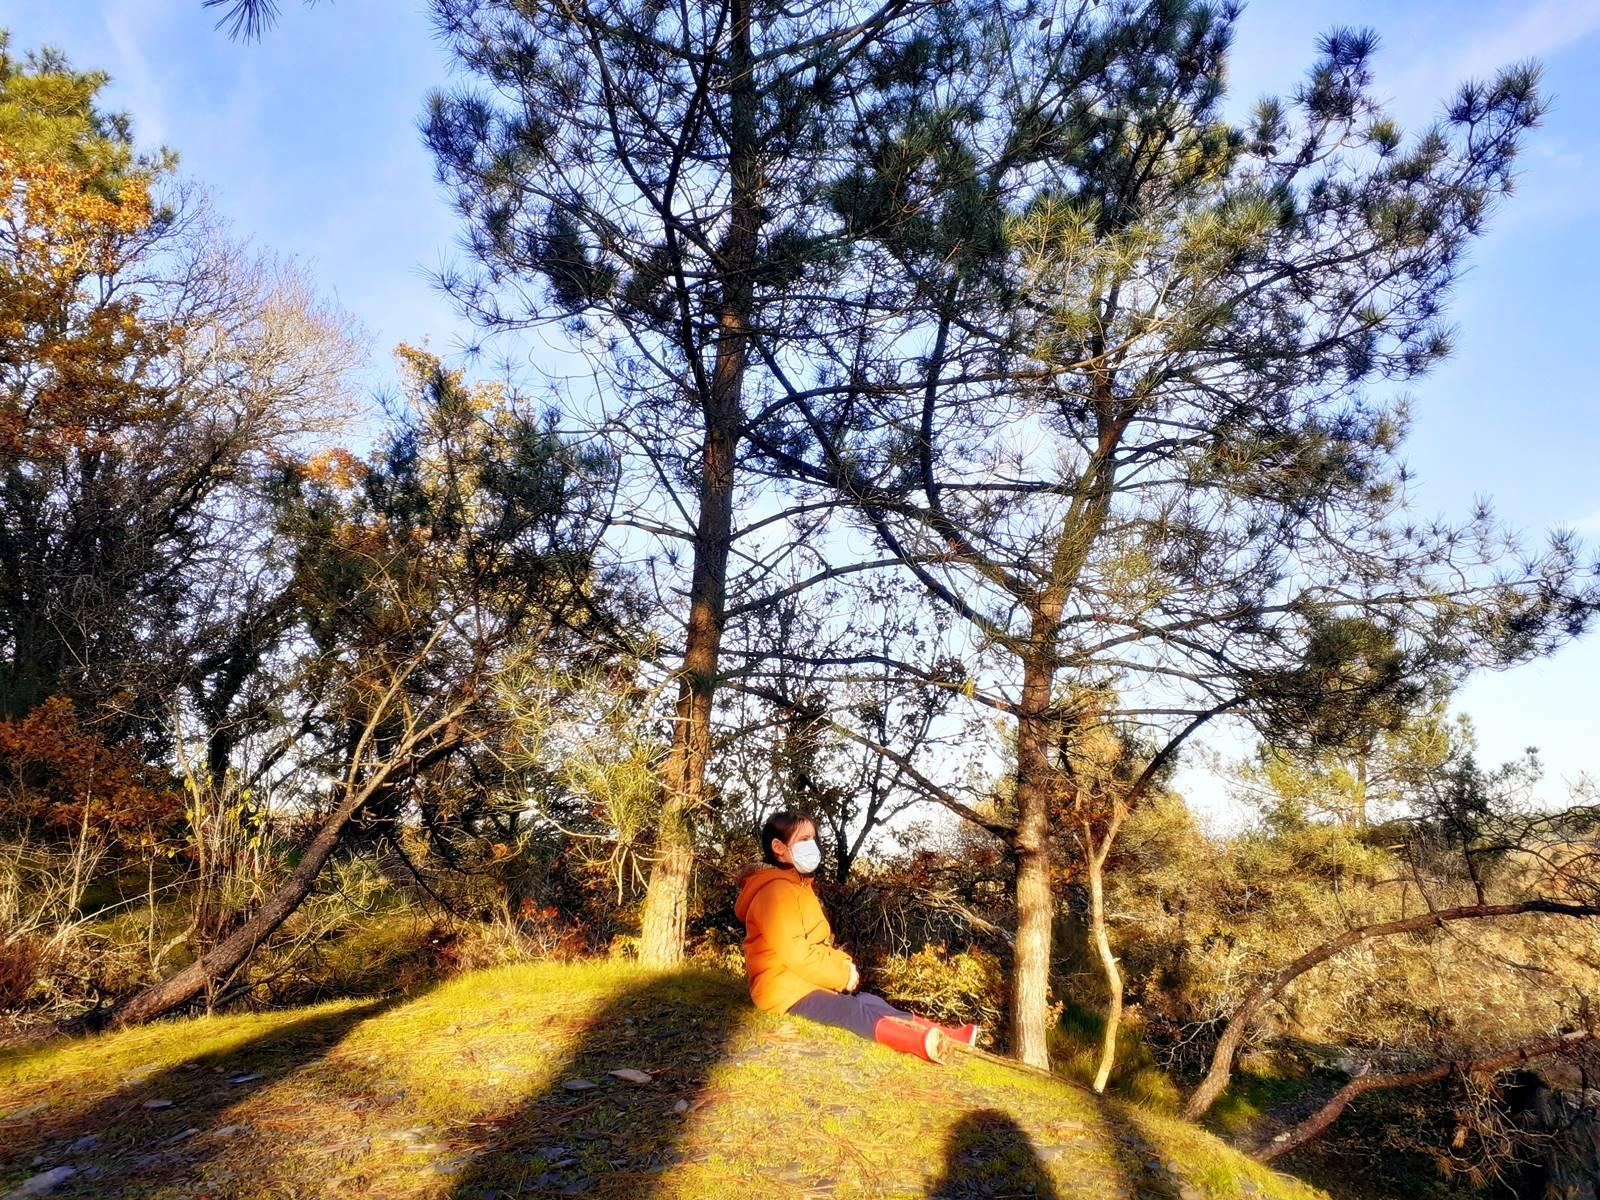 Moisdon la riviere faible20201128 172825